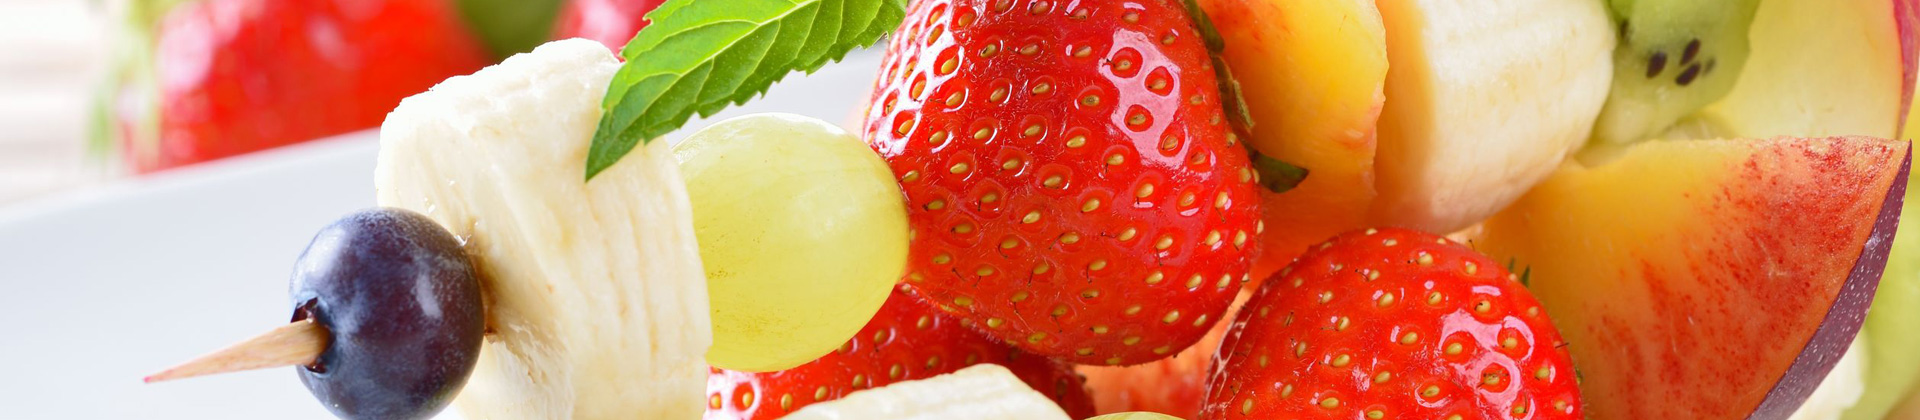 Spiesjes zomerfruit